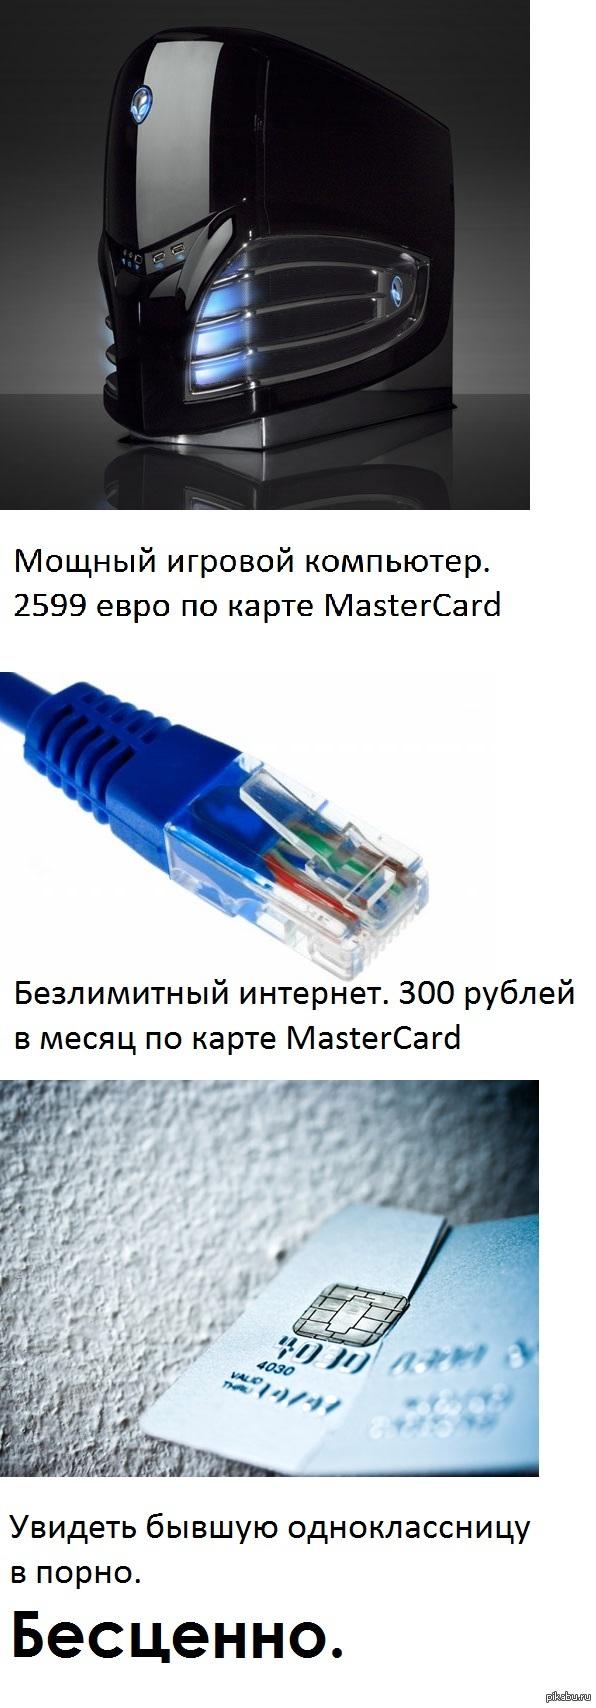 ... по карте MasterCard